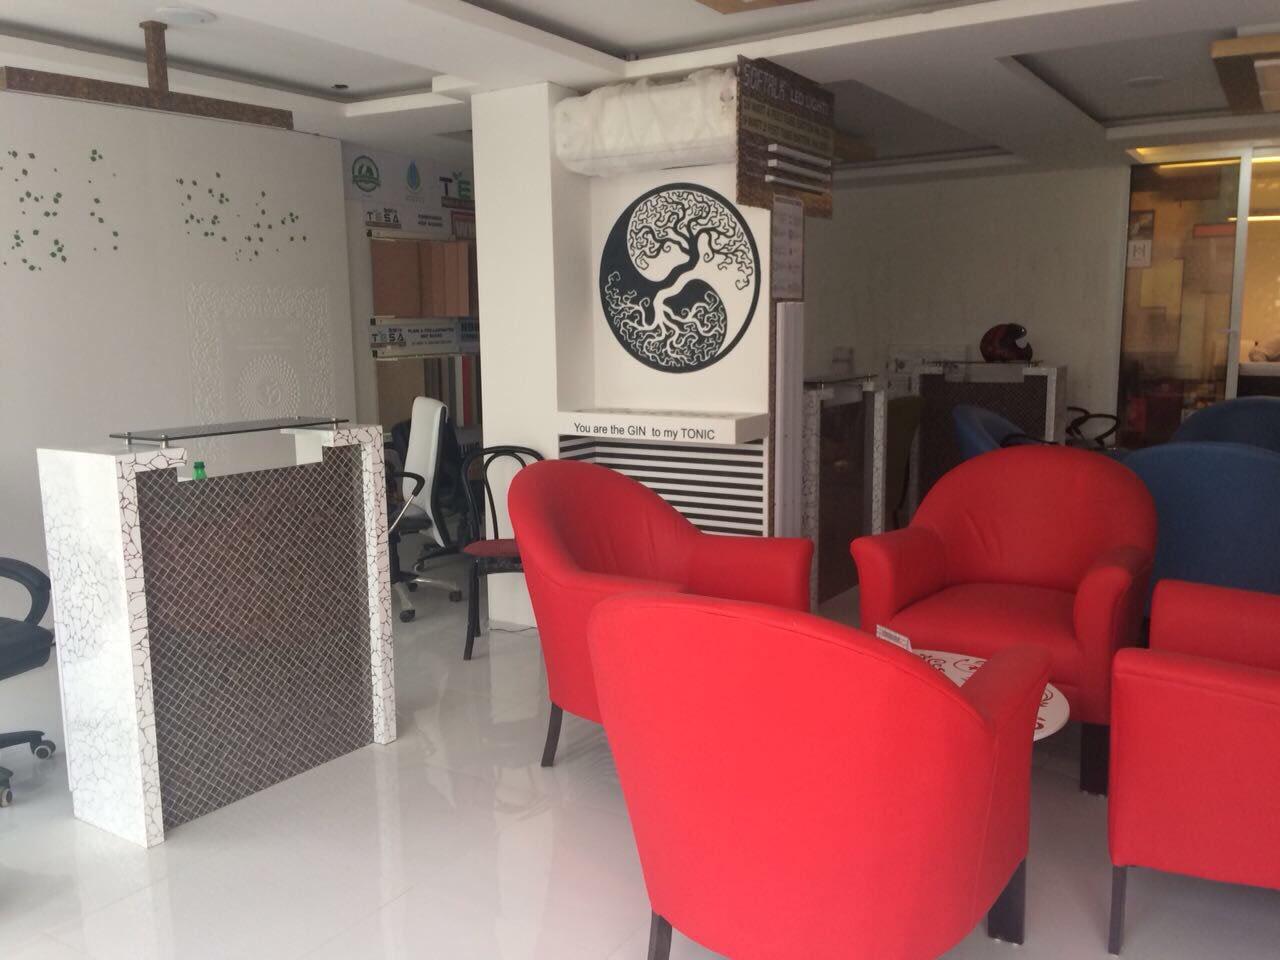 Creative zone by Rohit Sharma  Modern | Interior Design Photos & Ideas